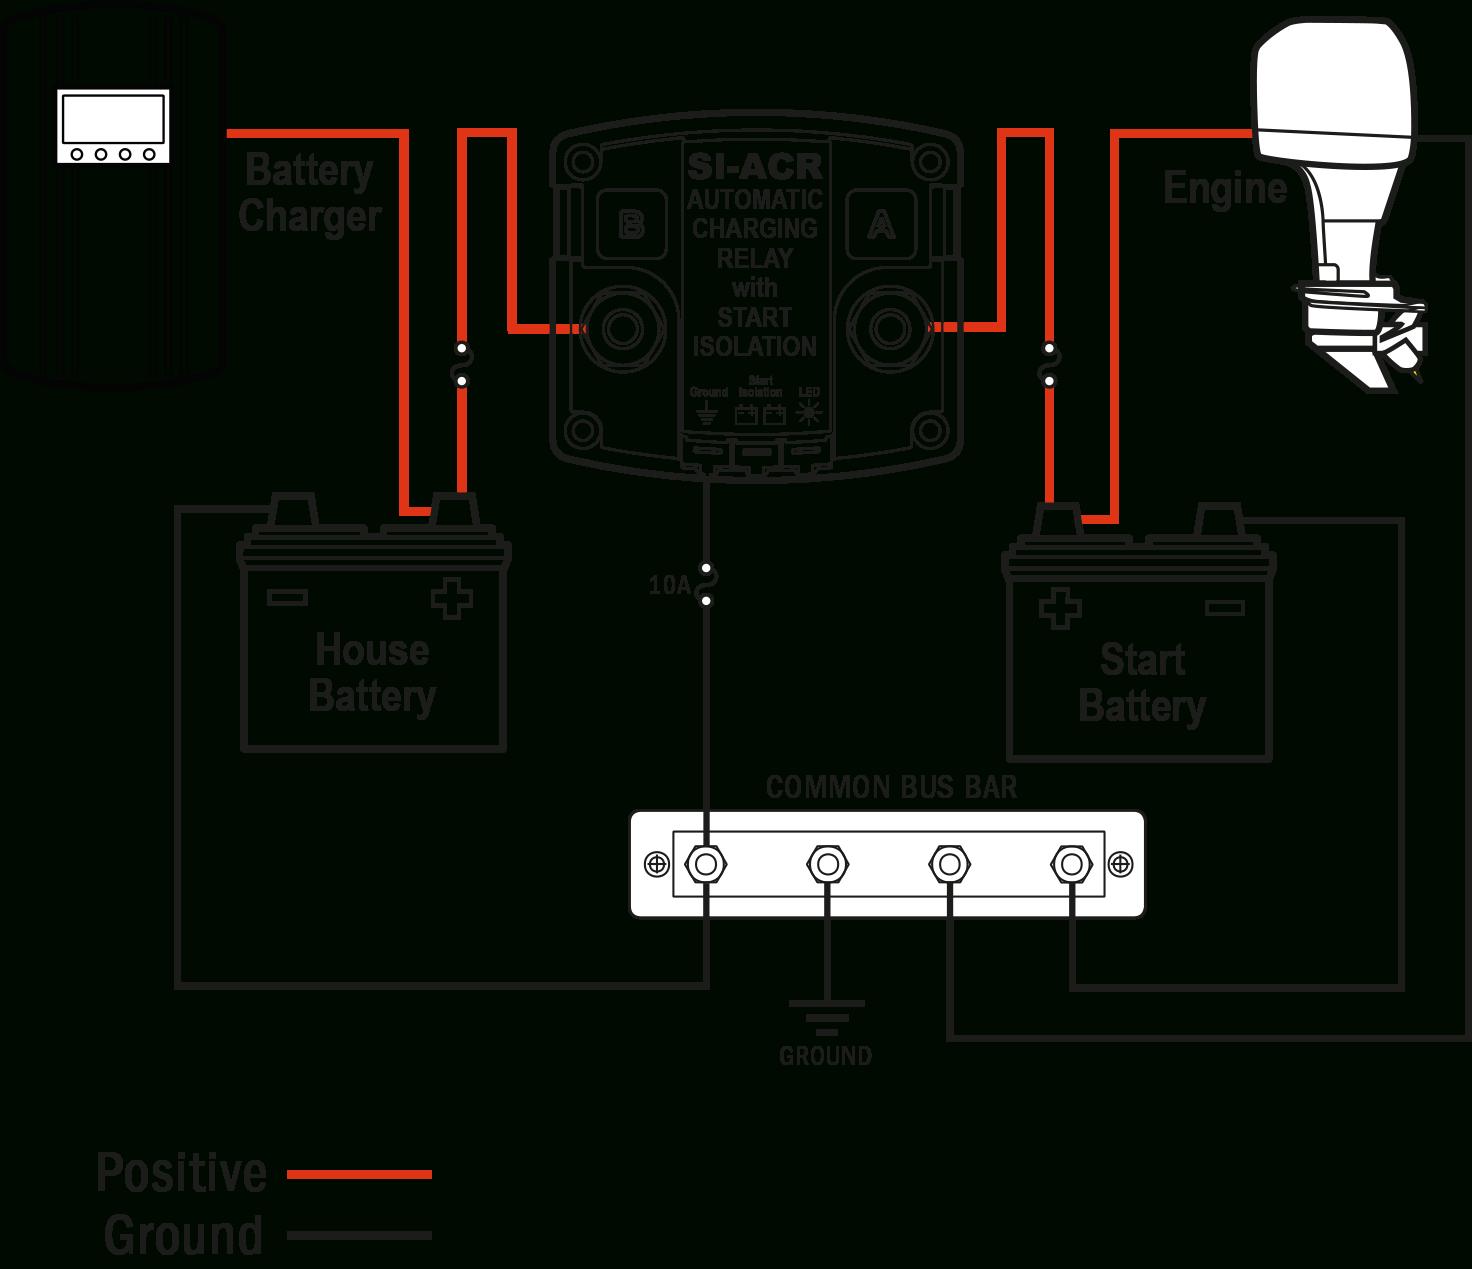 Marine Battery Switch Wiring Diagram 3 | Wiring Diagram - 3 Battery Boat Wiring Diagram